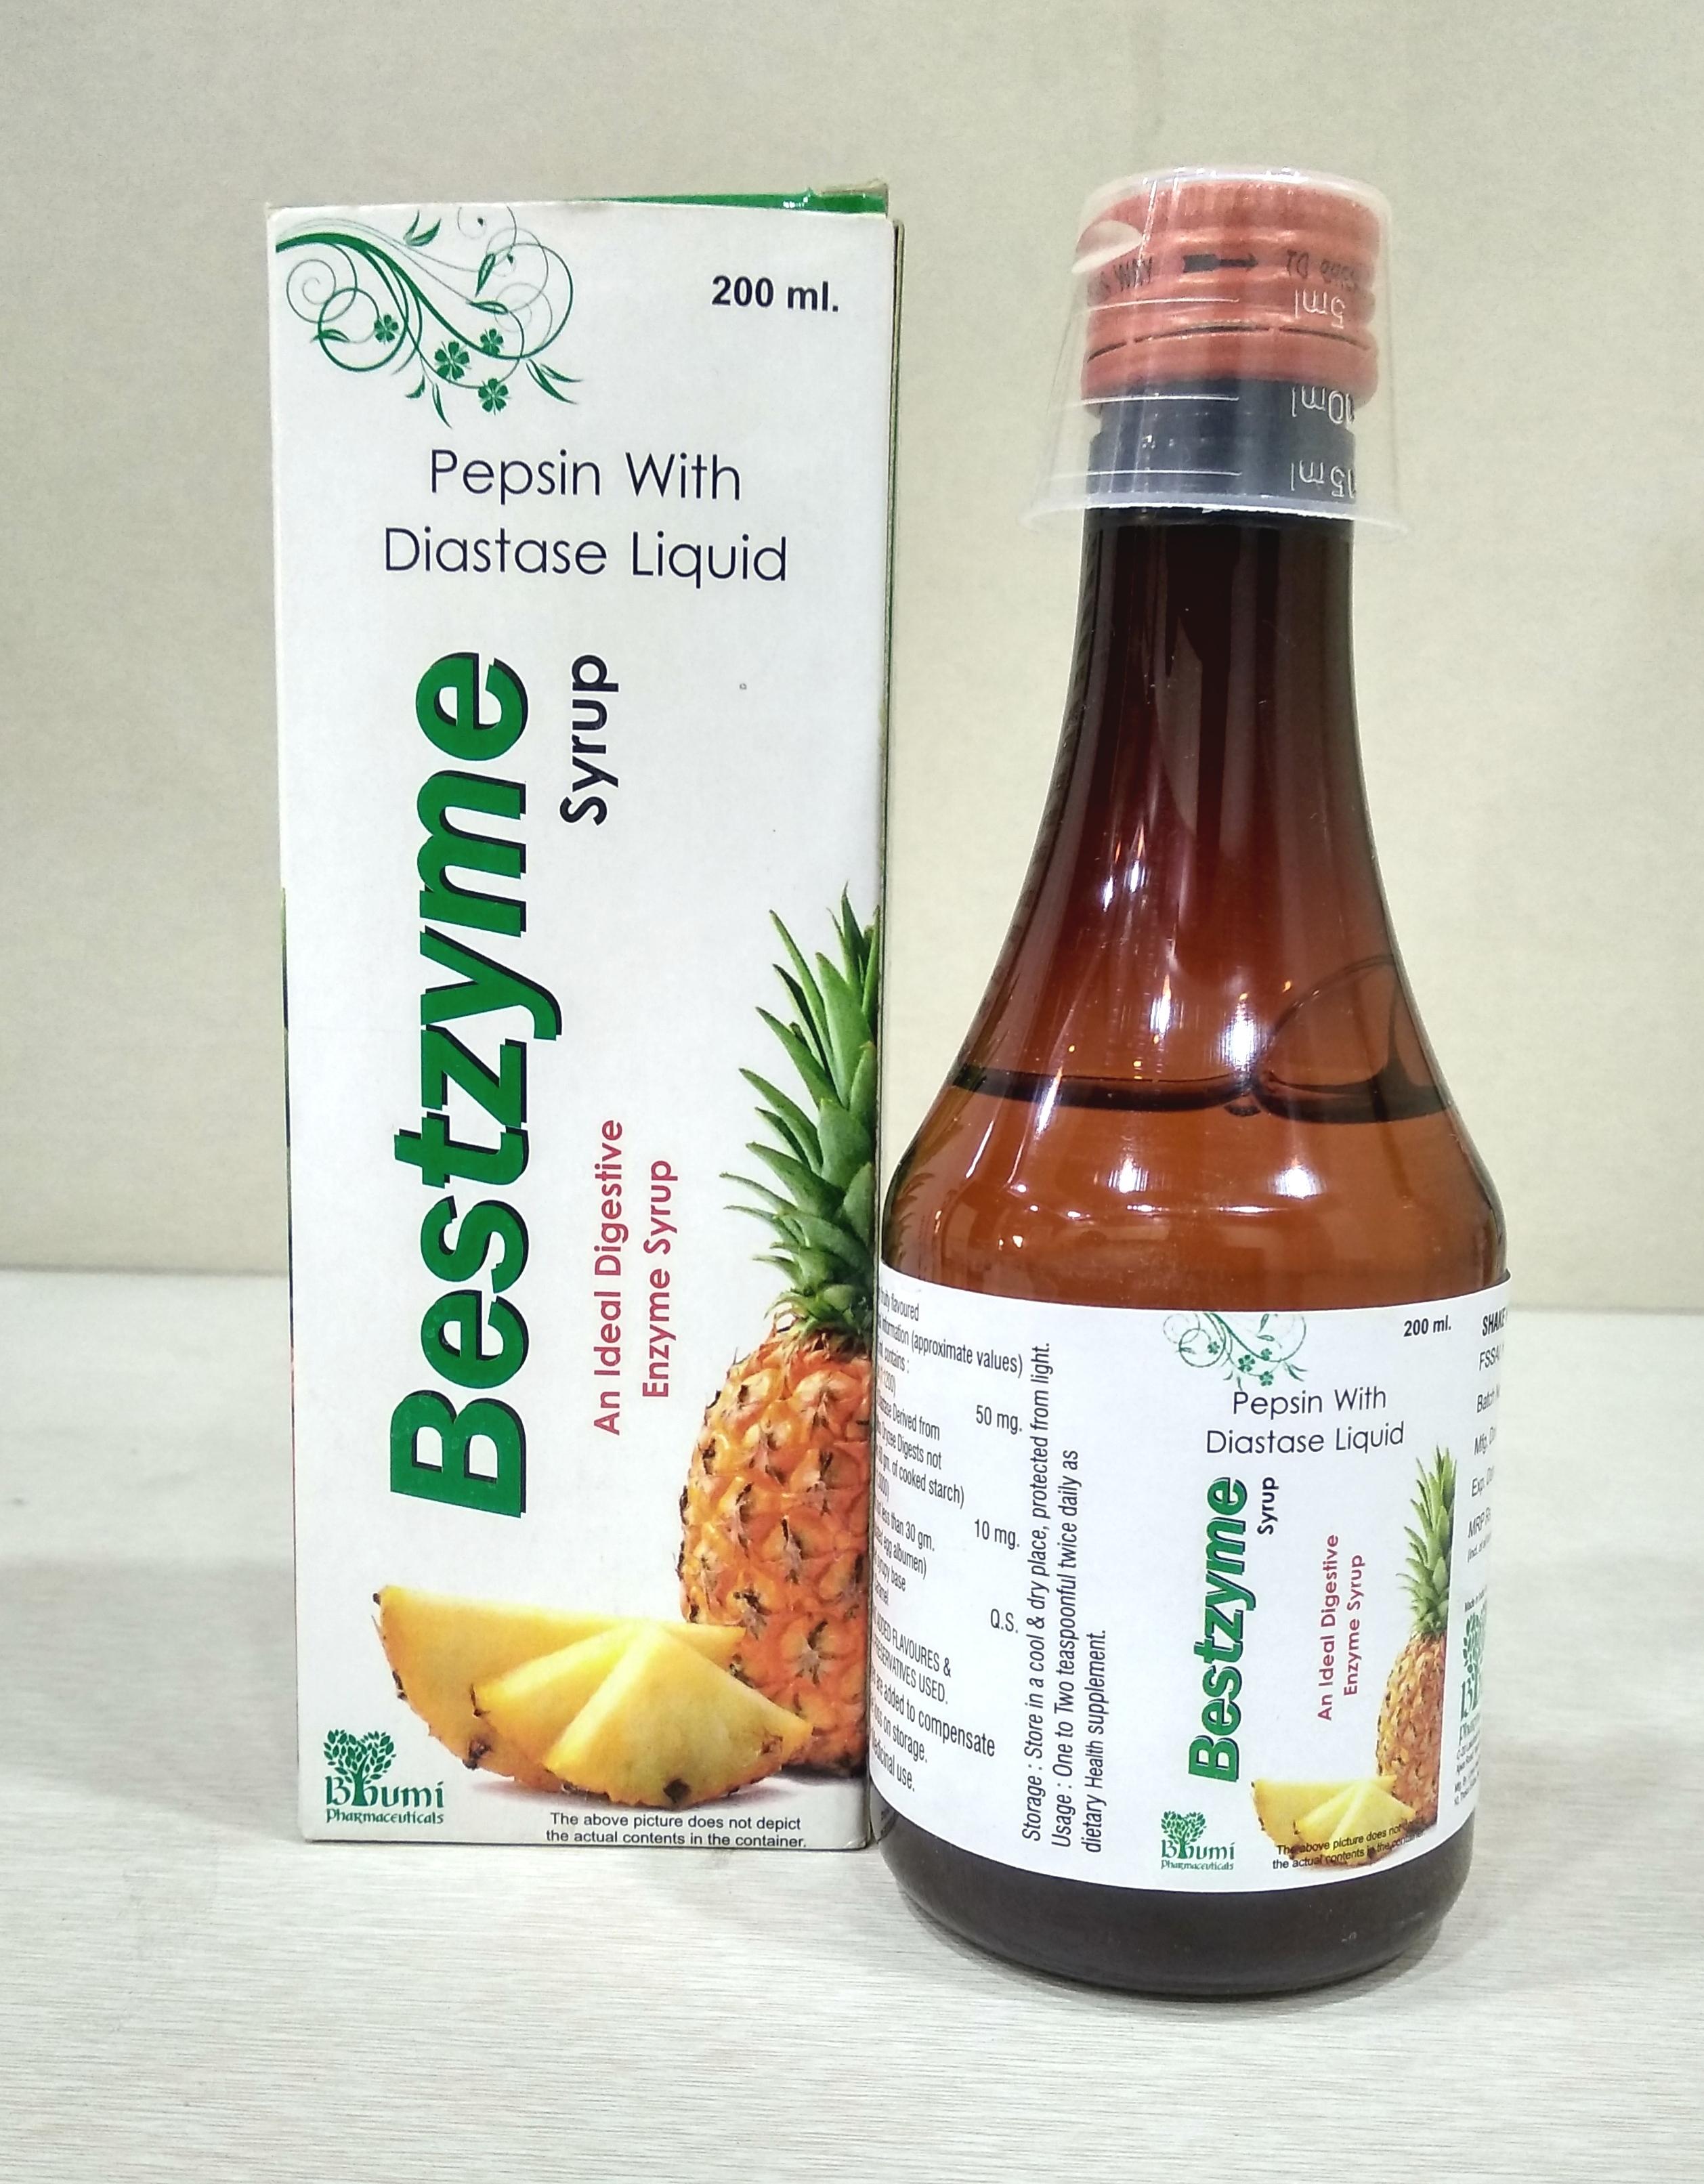 Diastase + Pepsin